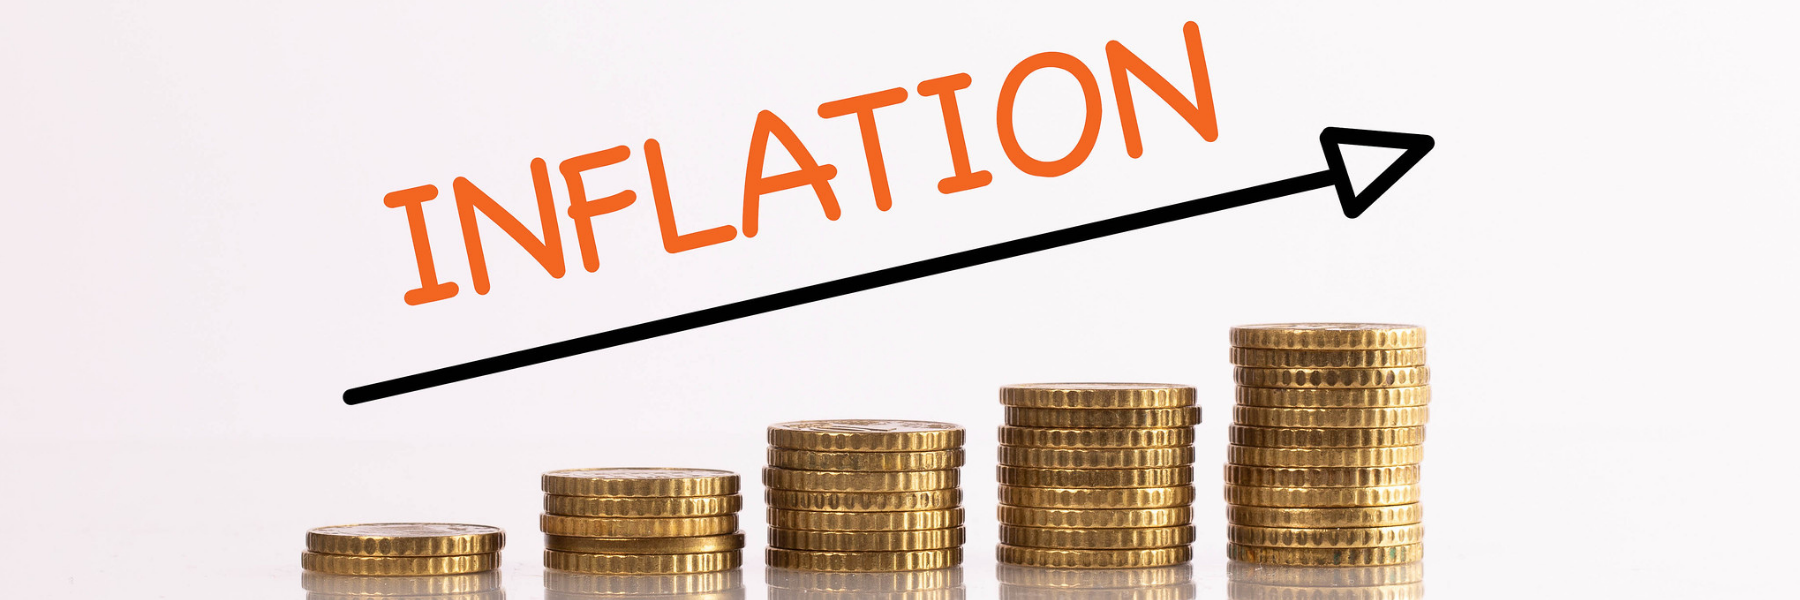 Inflation banque du canada